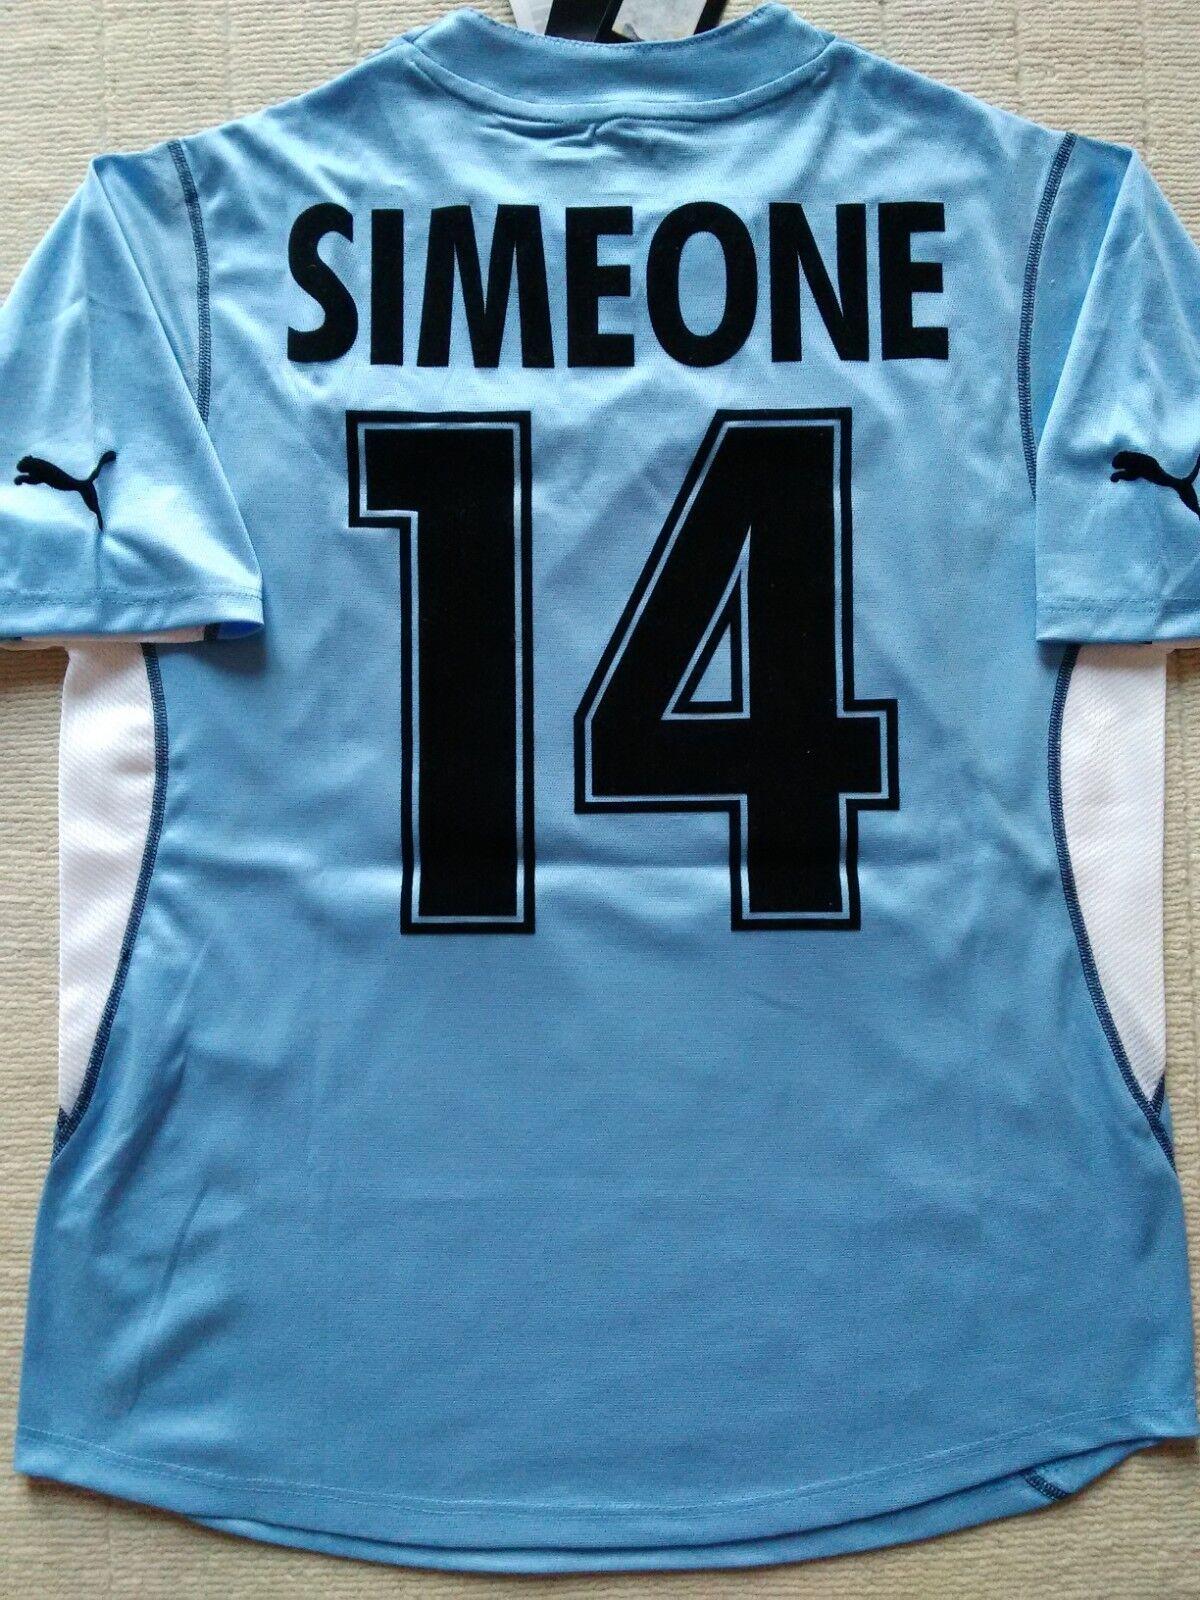 Simeone Lazio camiseta M 2001 2002 jersey shirt puma maglia Serie A